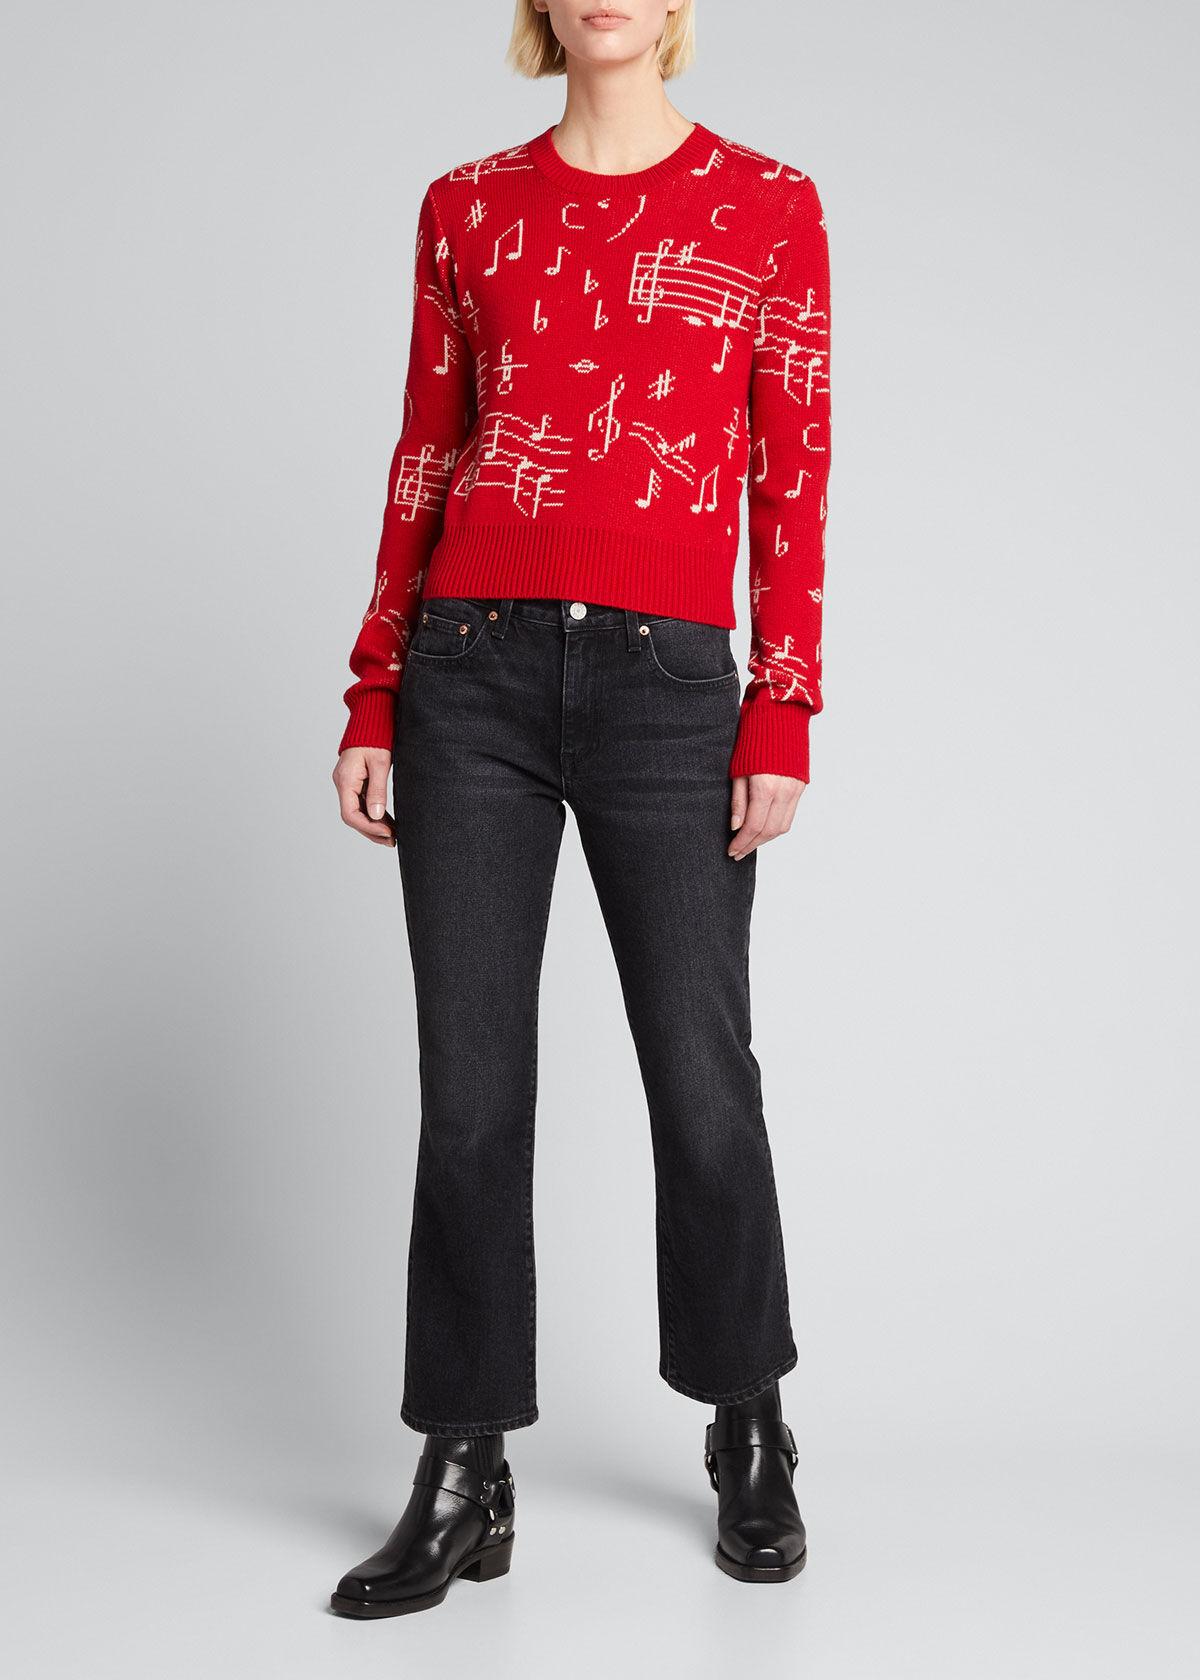 RE/DONE 60s Shrunken Wool Sweater  - female - RED MUSICAL NOTE - Size: Medium